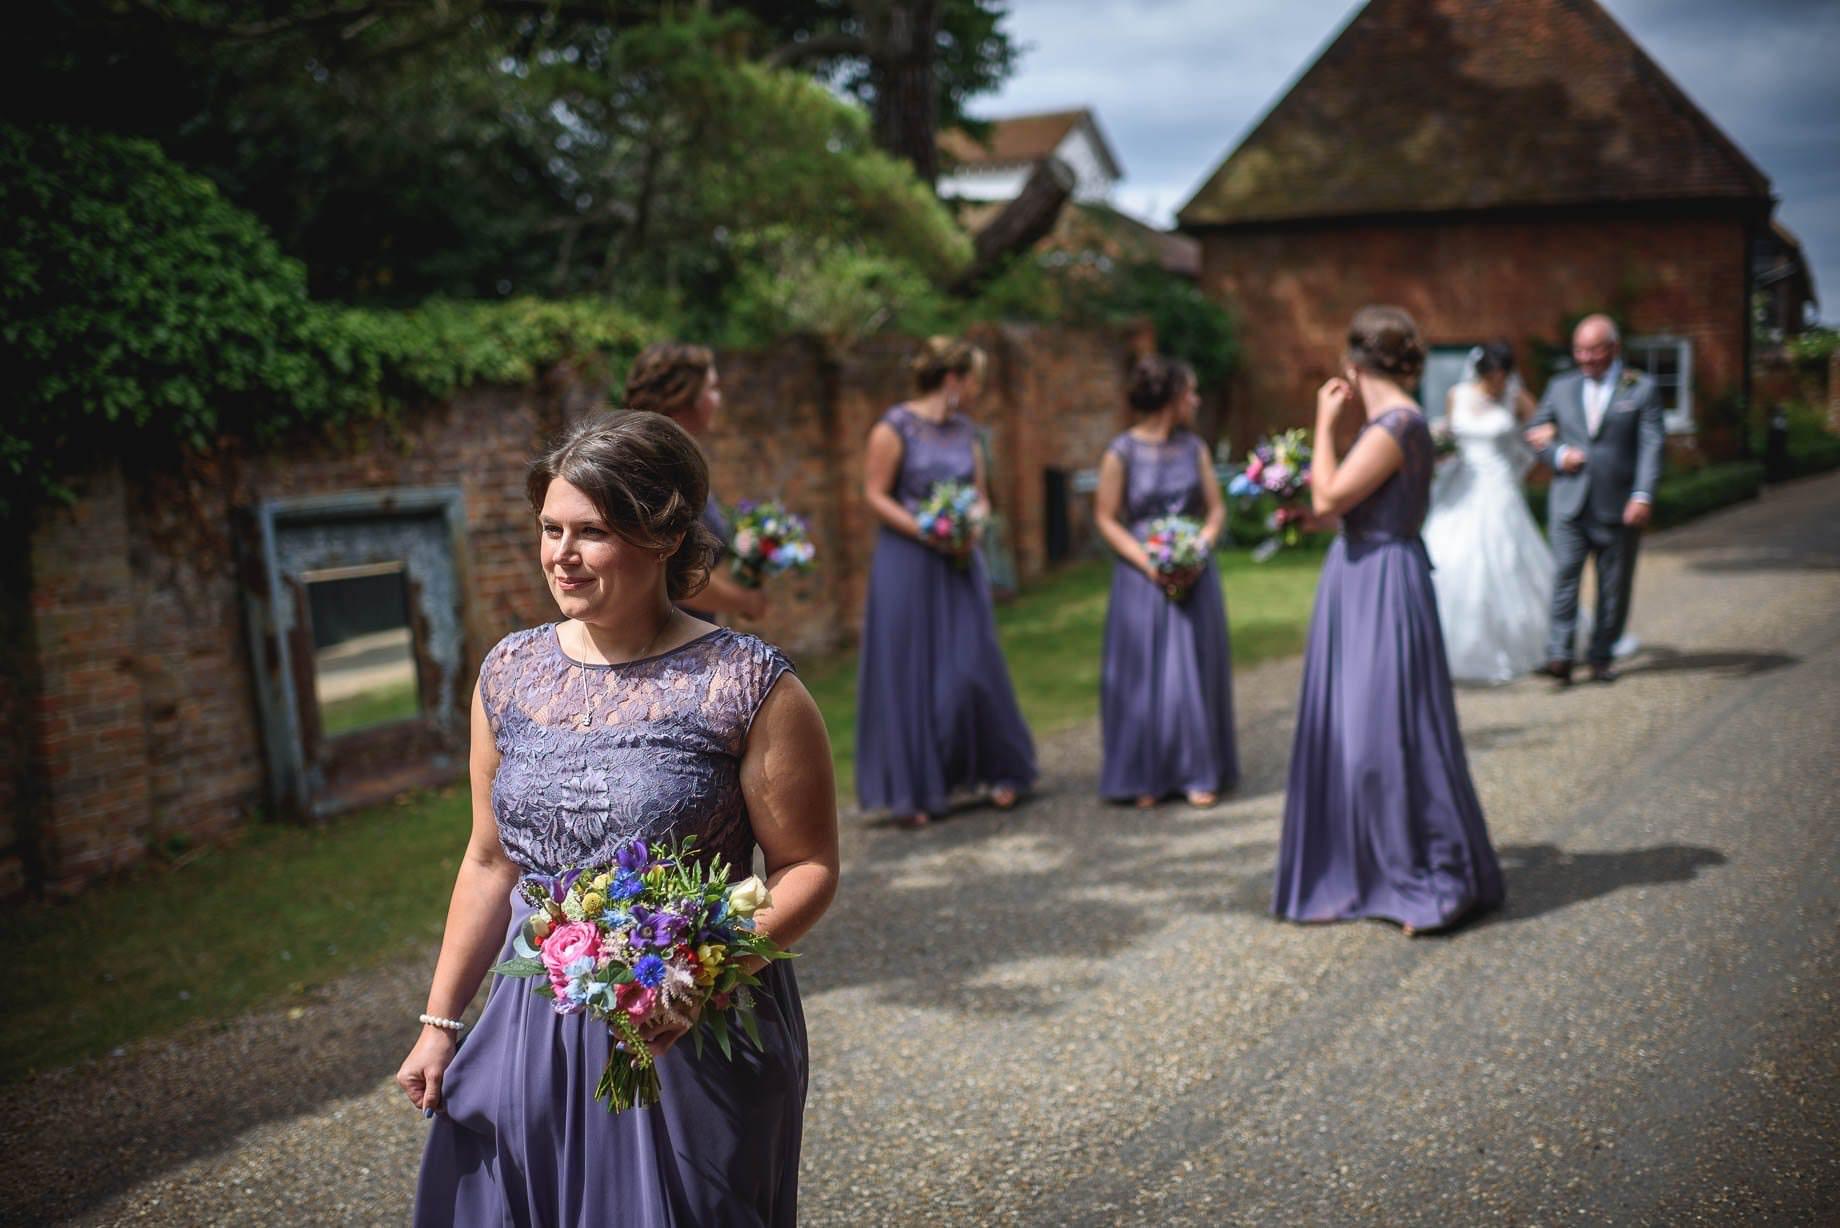 Gaynes Park wedding photography - Guy Collier Photography - Rachel and Jon (58 of 169)